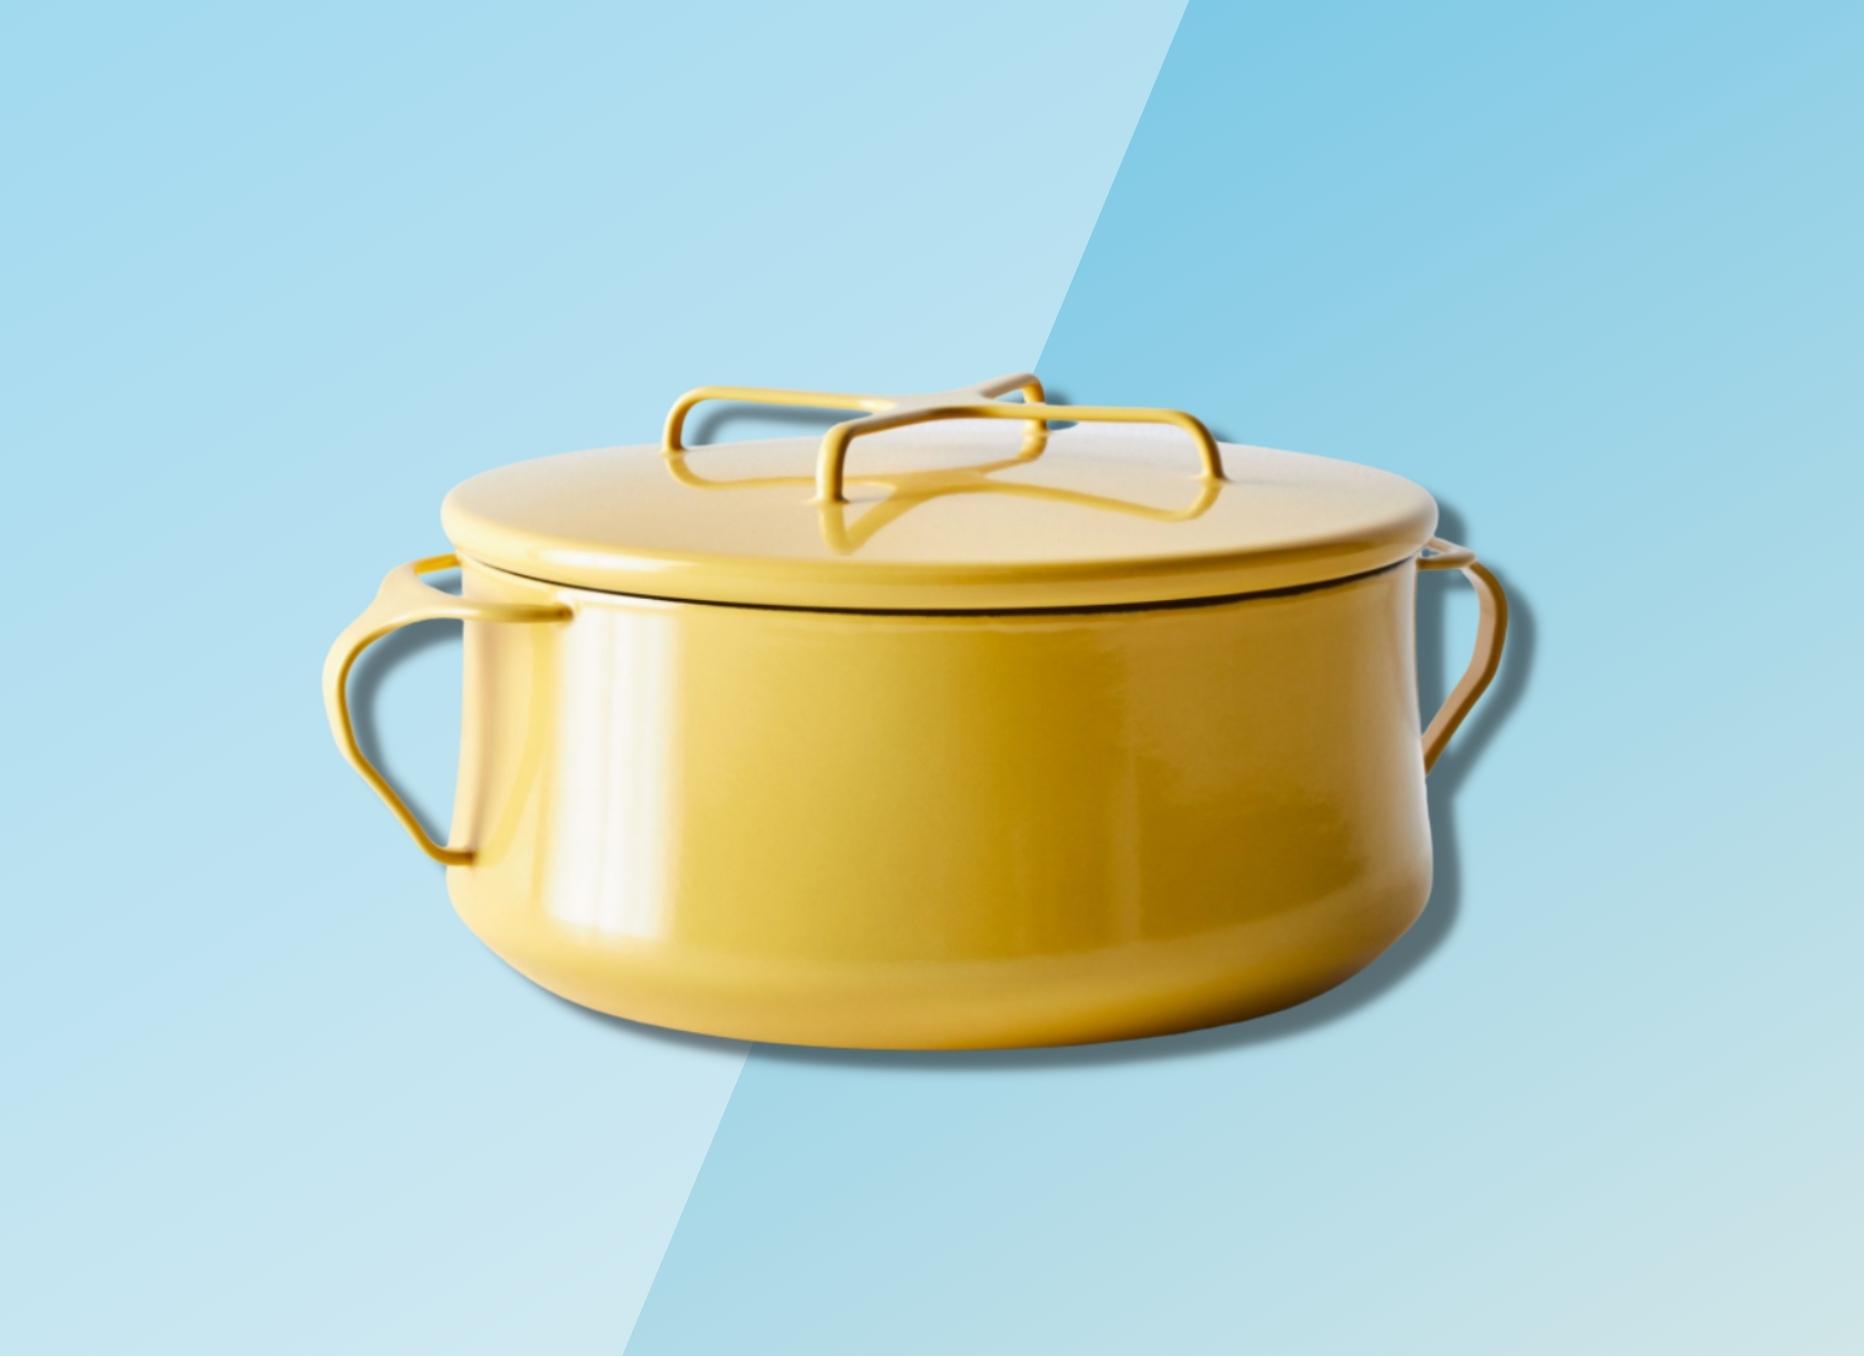 Casserole dish